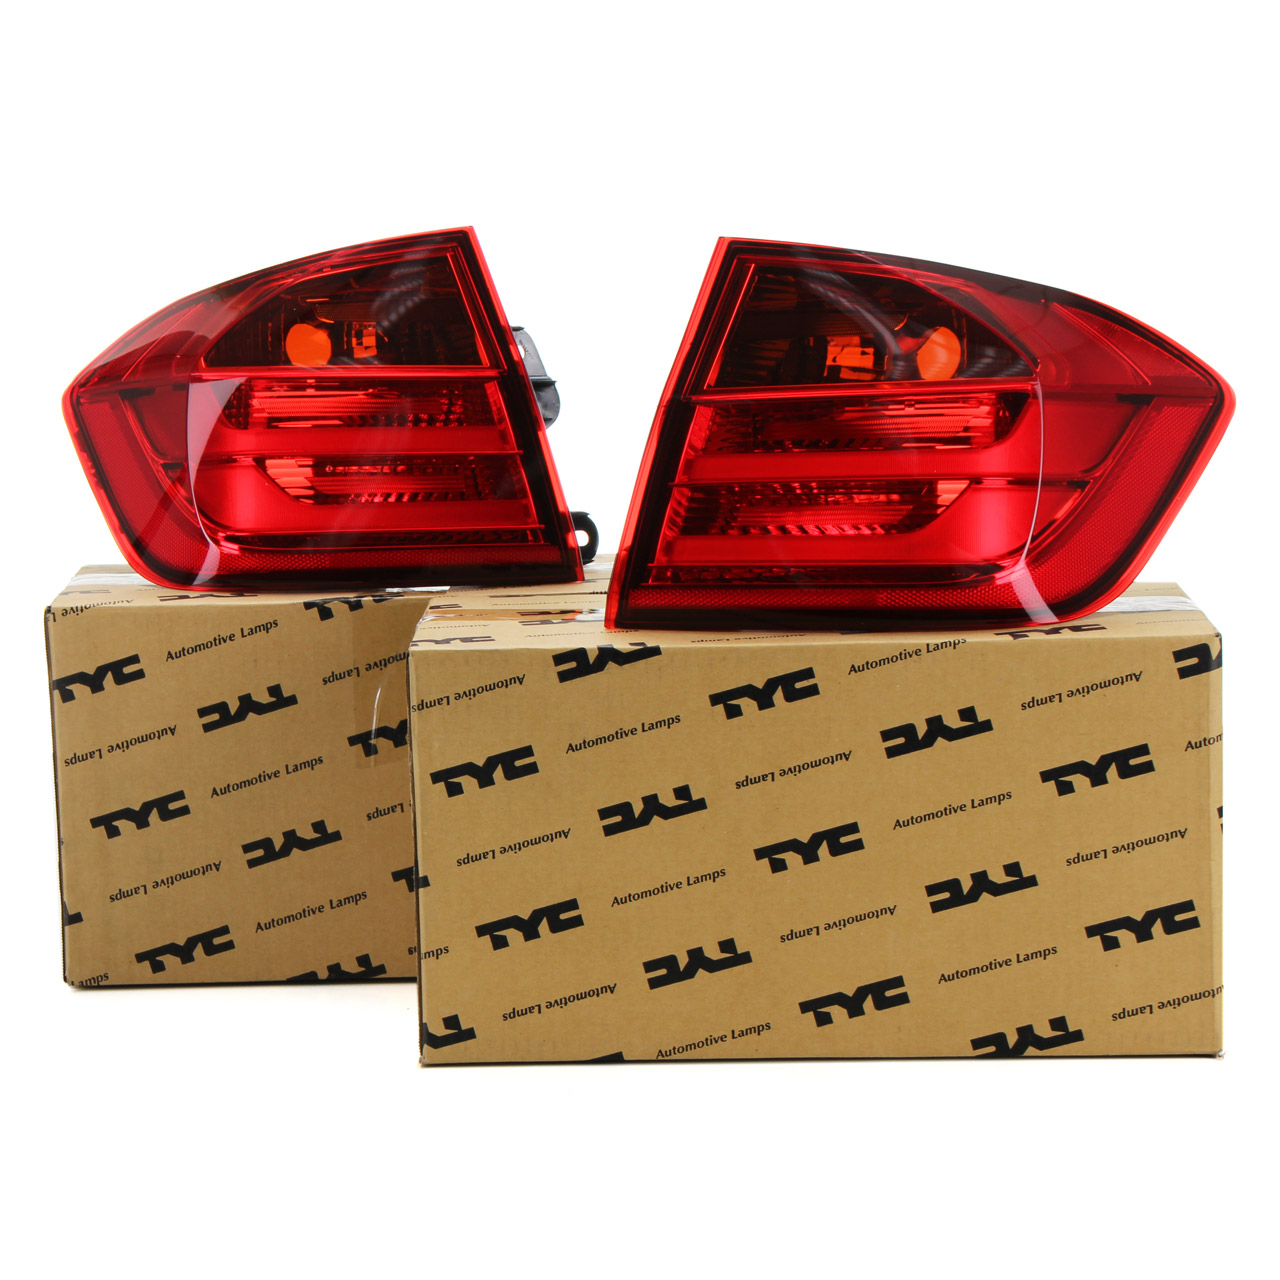 2x TYC Heckleuchte Rücklicht LED BMW 3er F30 F80 Limo aussen links + rechts